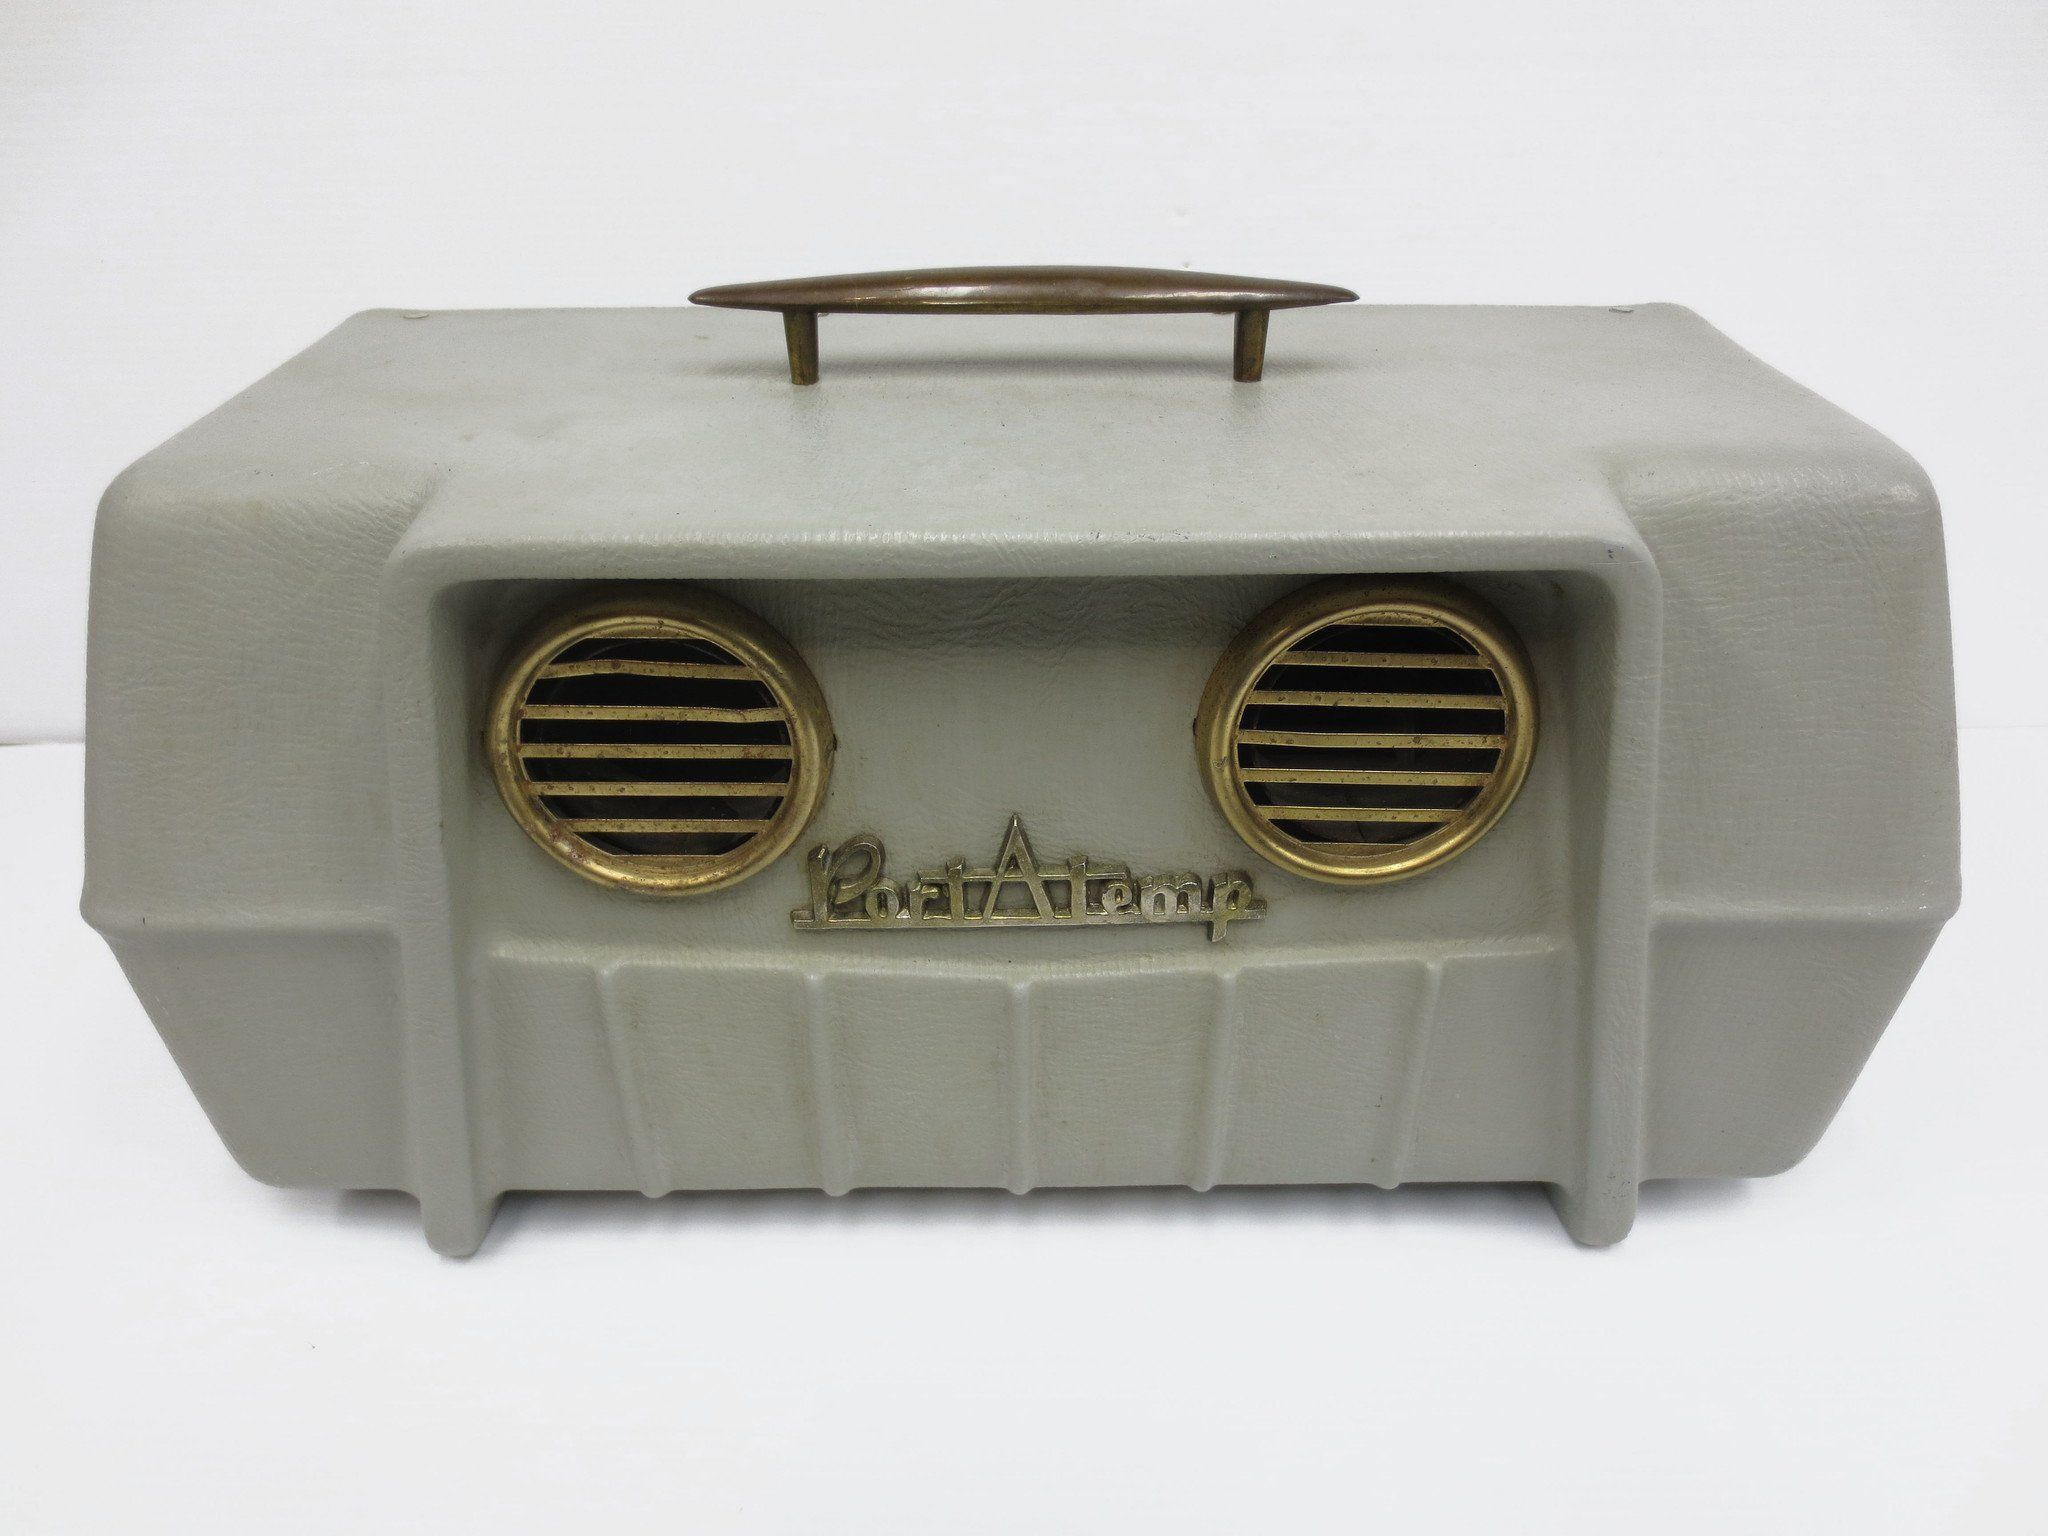 Vintage 1960's Portable Air Conditioning Unit, Vintage